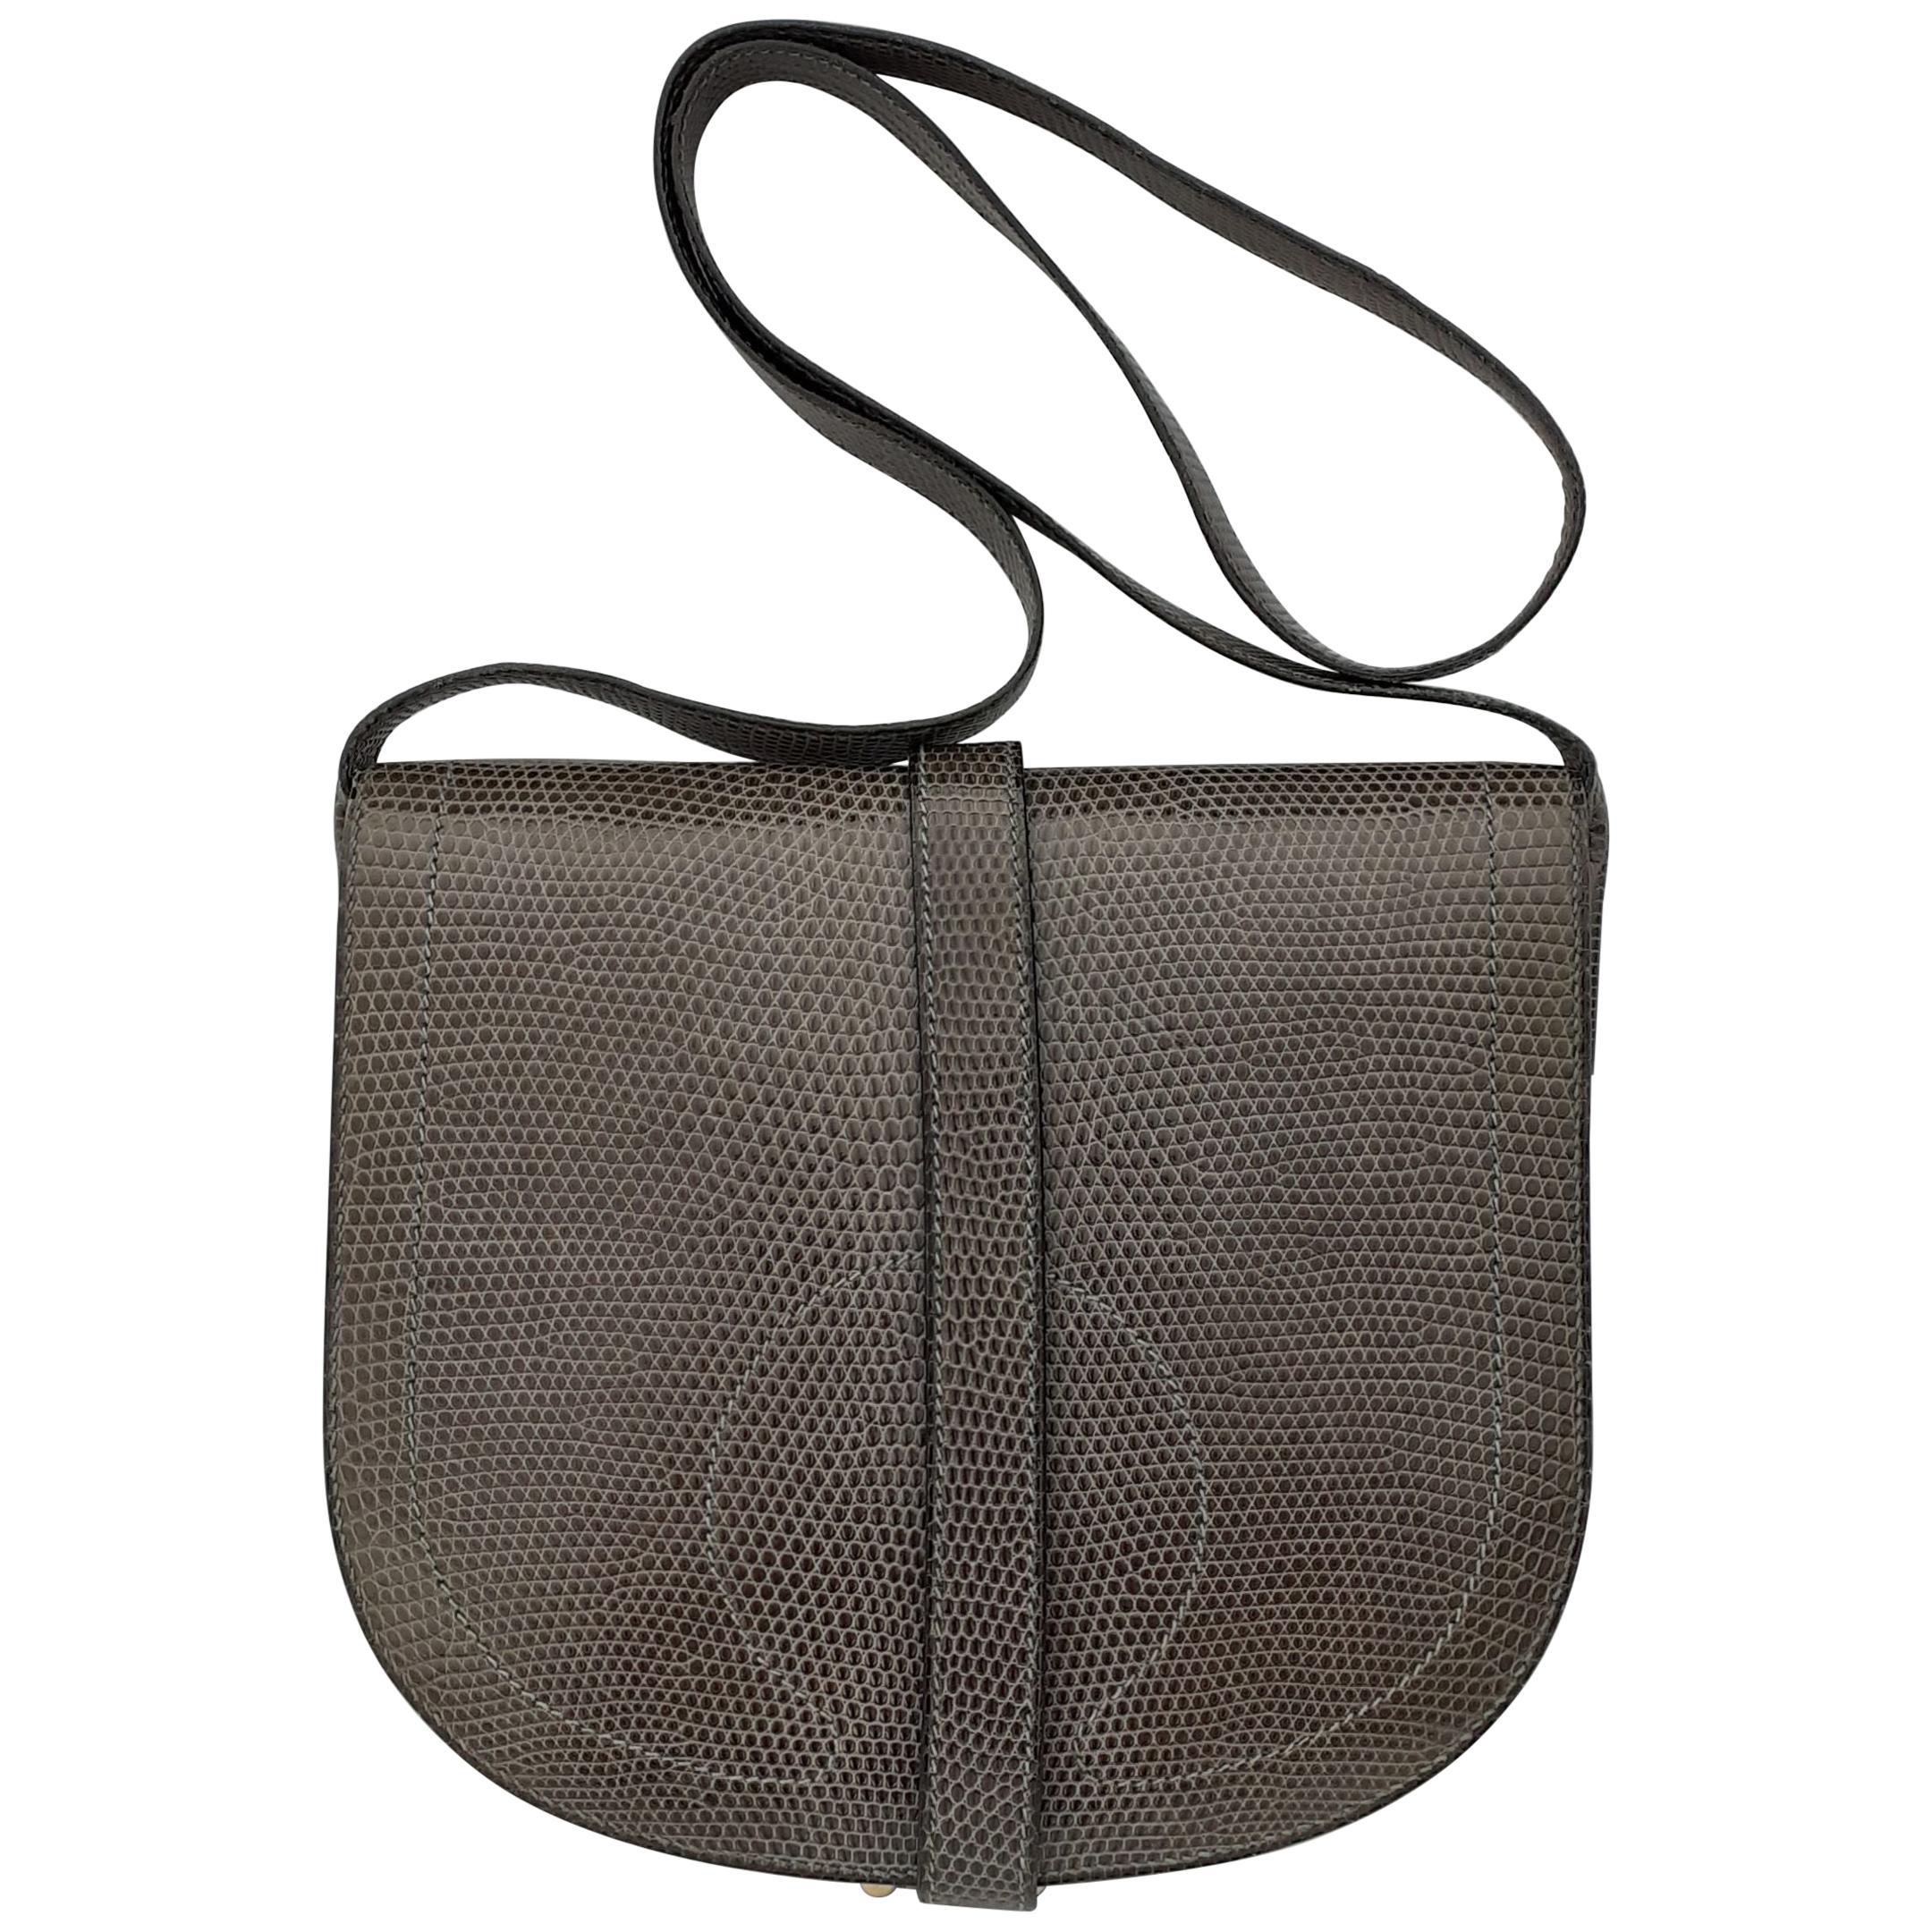 Exceptional Hermès Shoulder Bag Purse Green-Grey Lizard Gold Hdw RARE